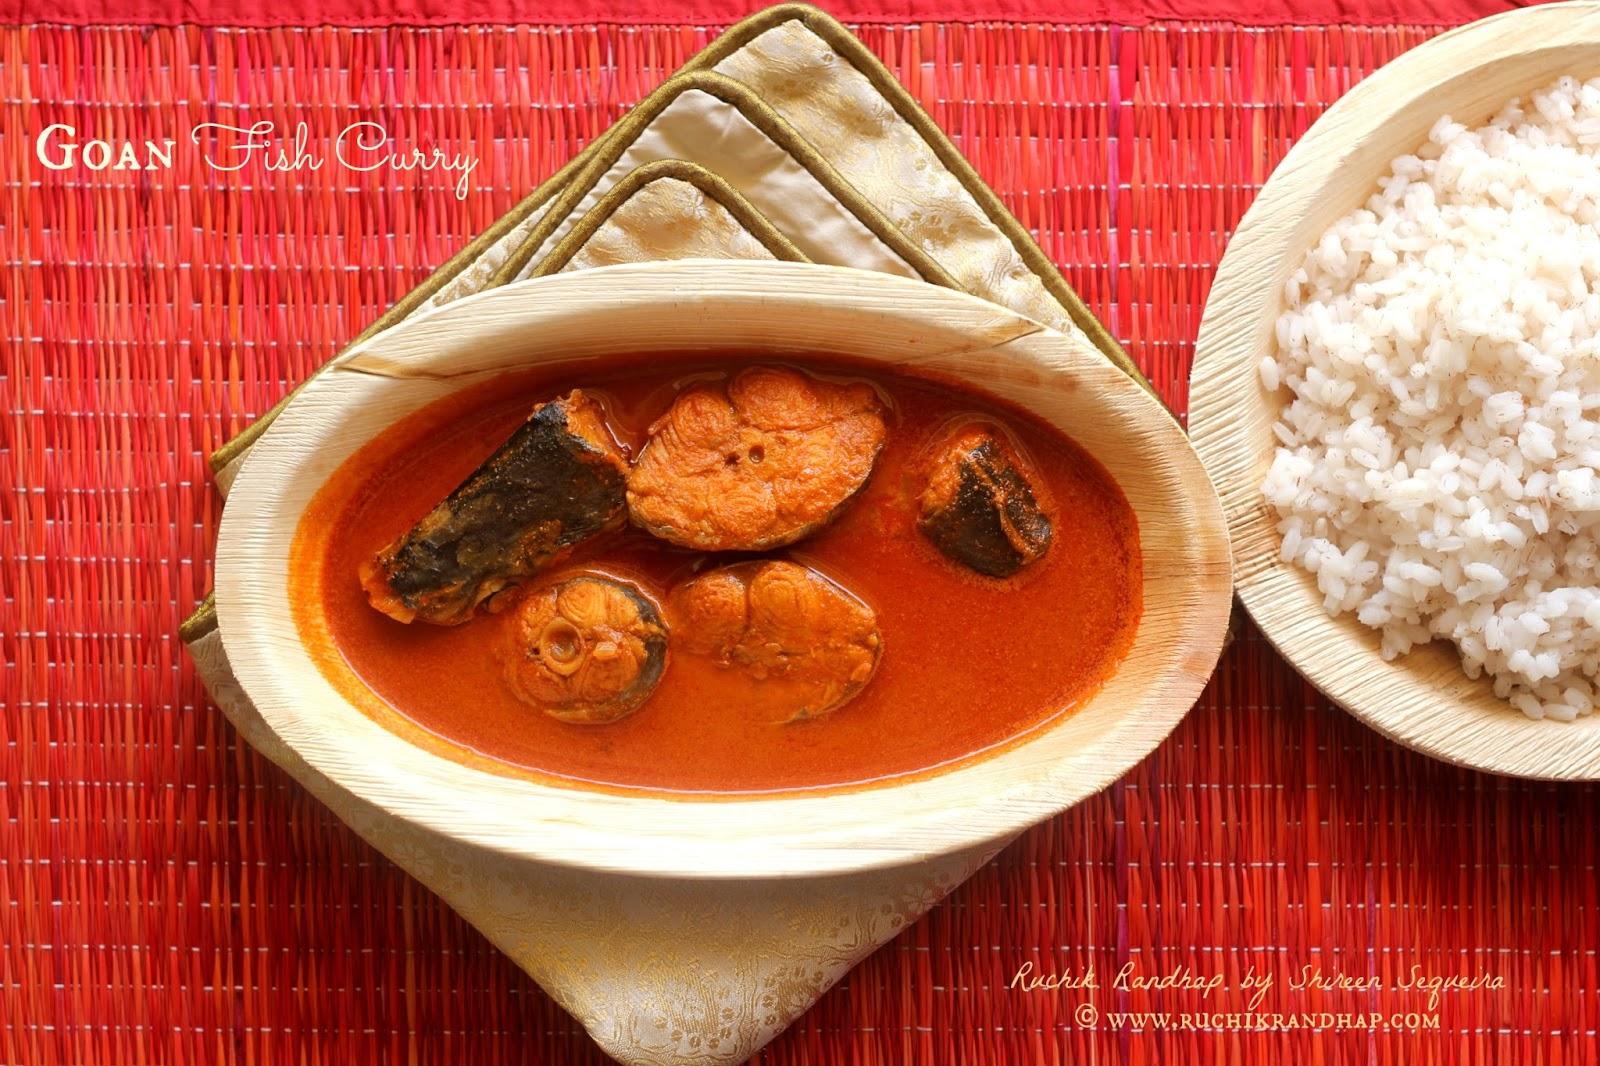 Goan fish curry ruchik randhap for Goan fish curry recipe